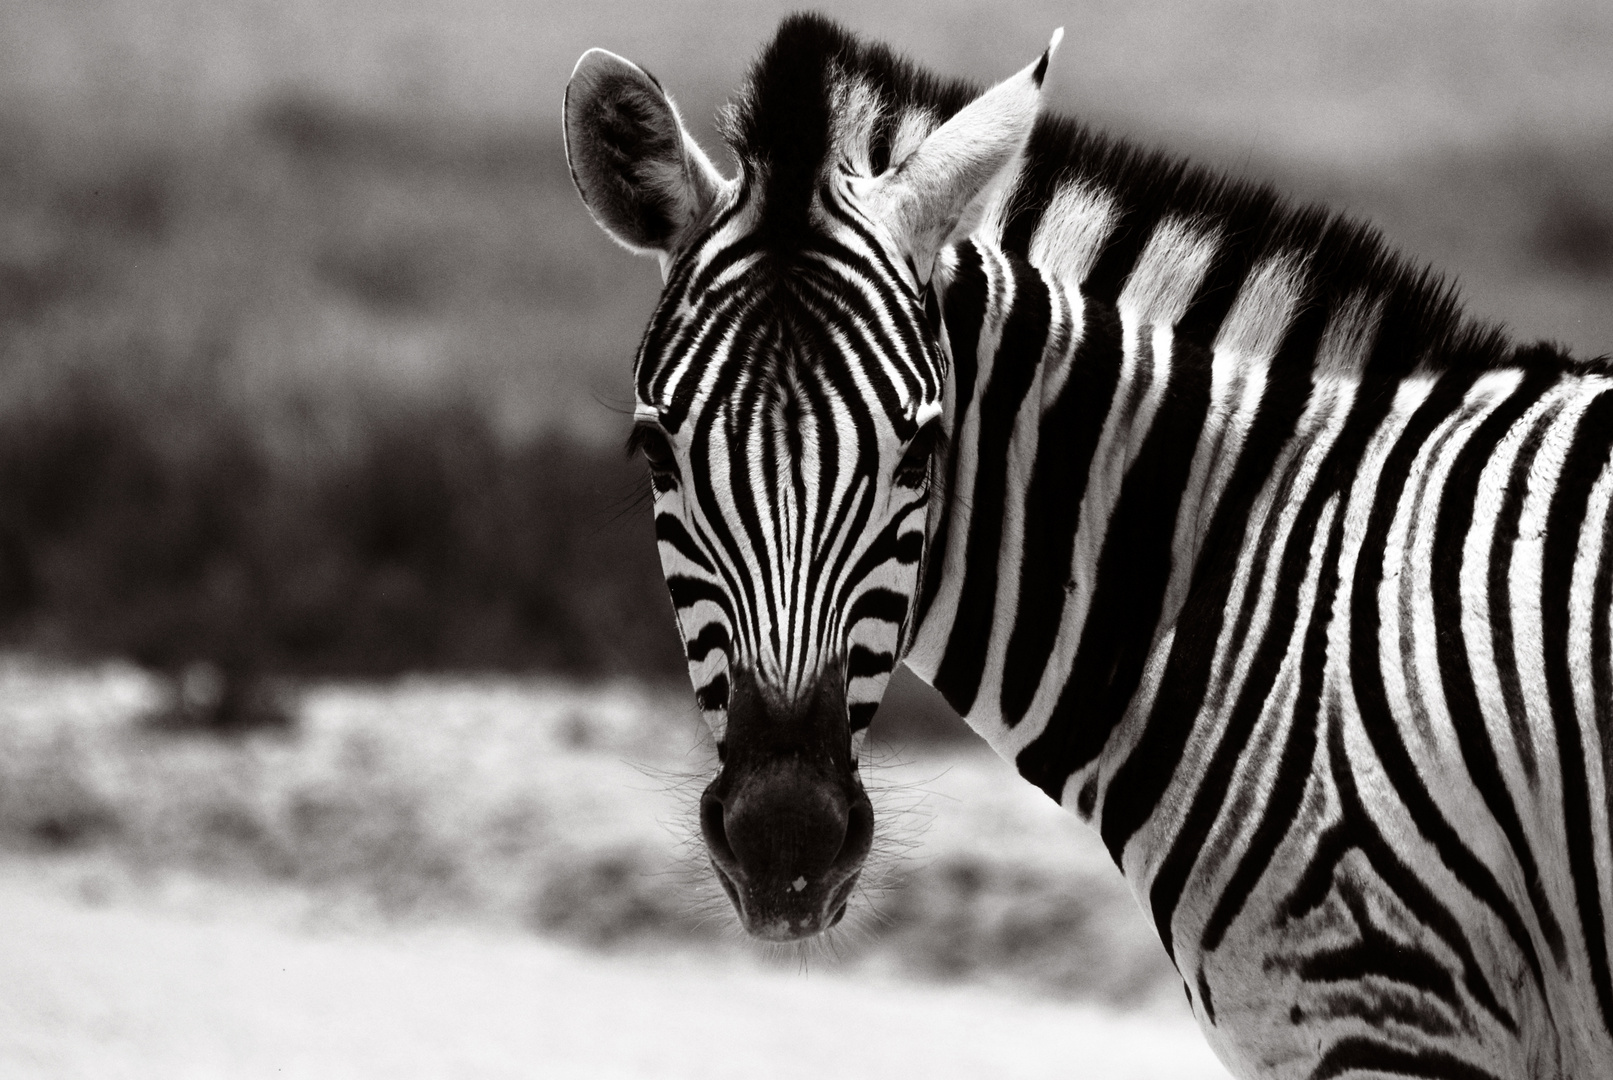 Zebra, Etosha Nationalpark, Namibia